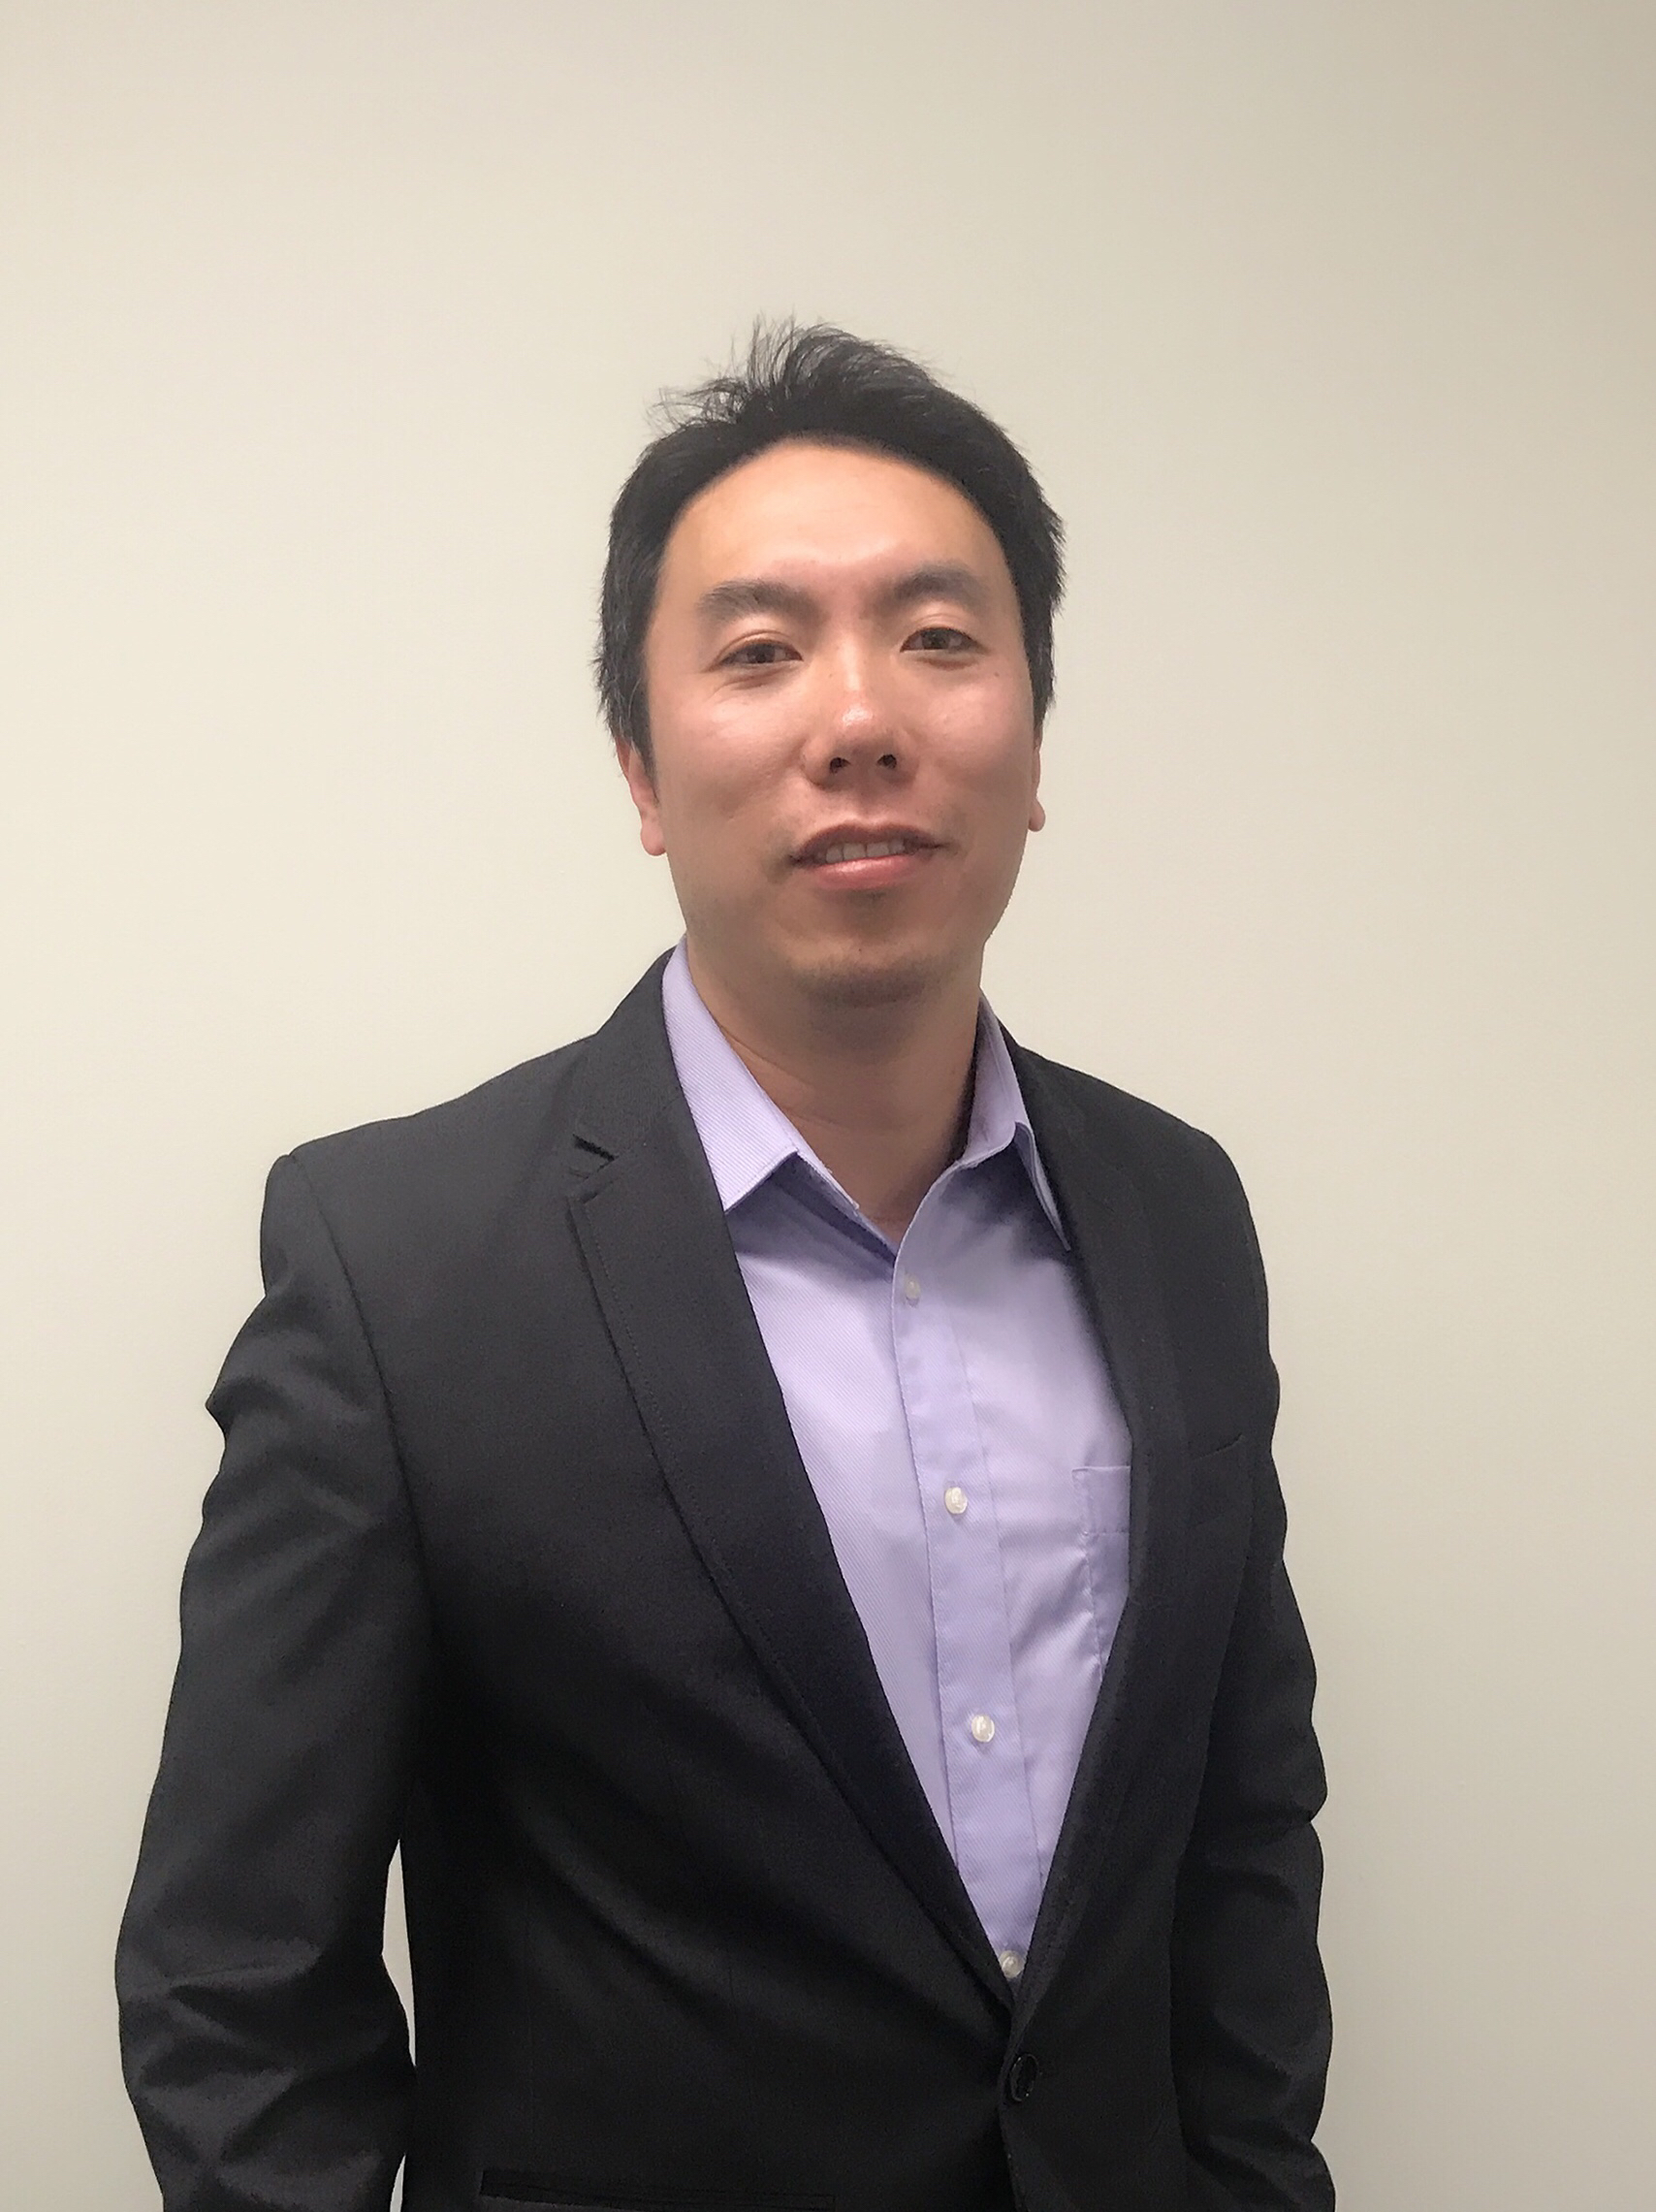 Michael Qiu